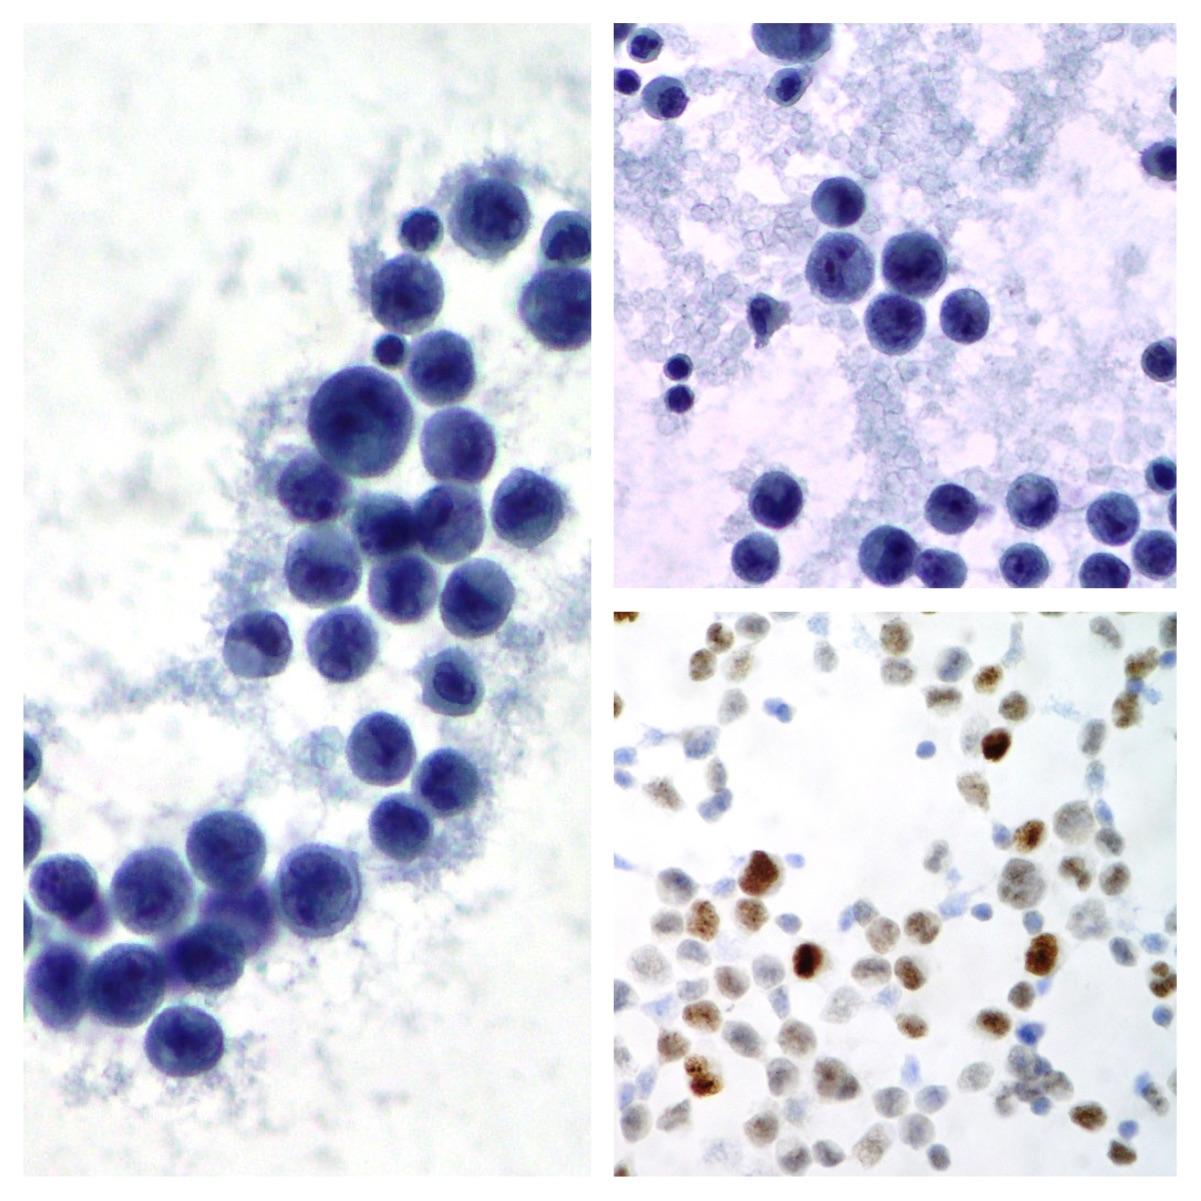 metastatic cancer pleural effusion cancerul ovarian doare